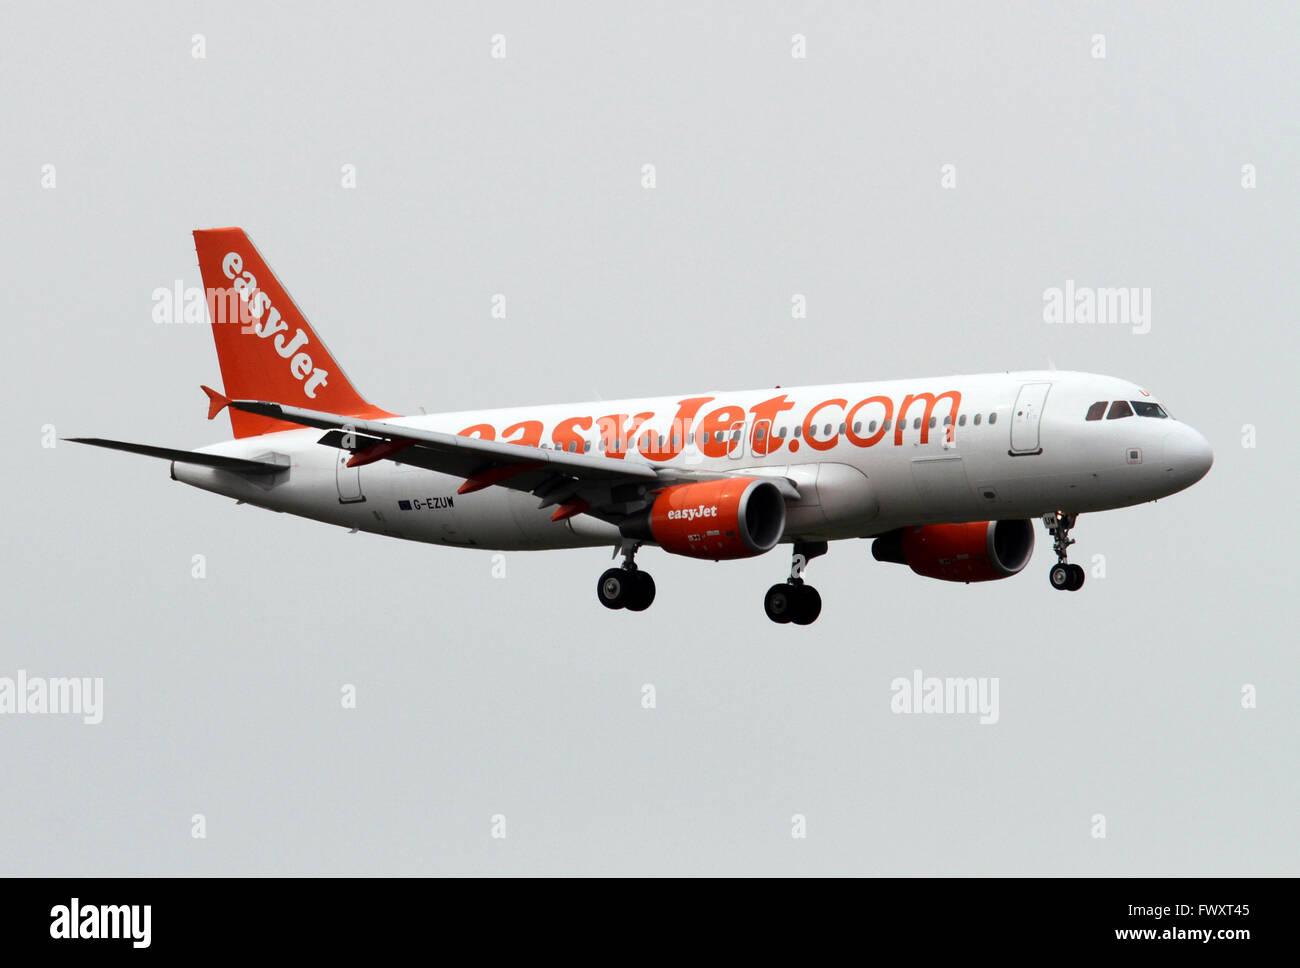 EasyJet, Airbus A320-214 at Linate airport, Milan, Italy Stock Photo